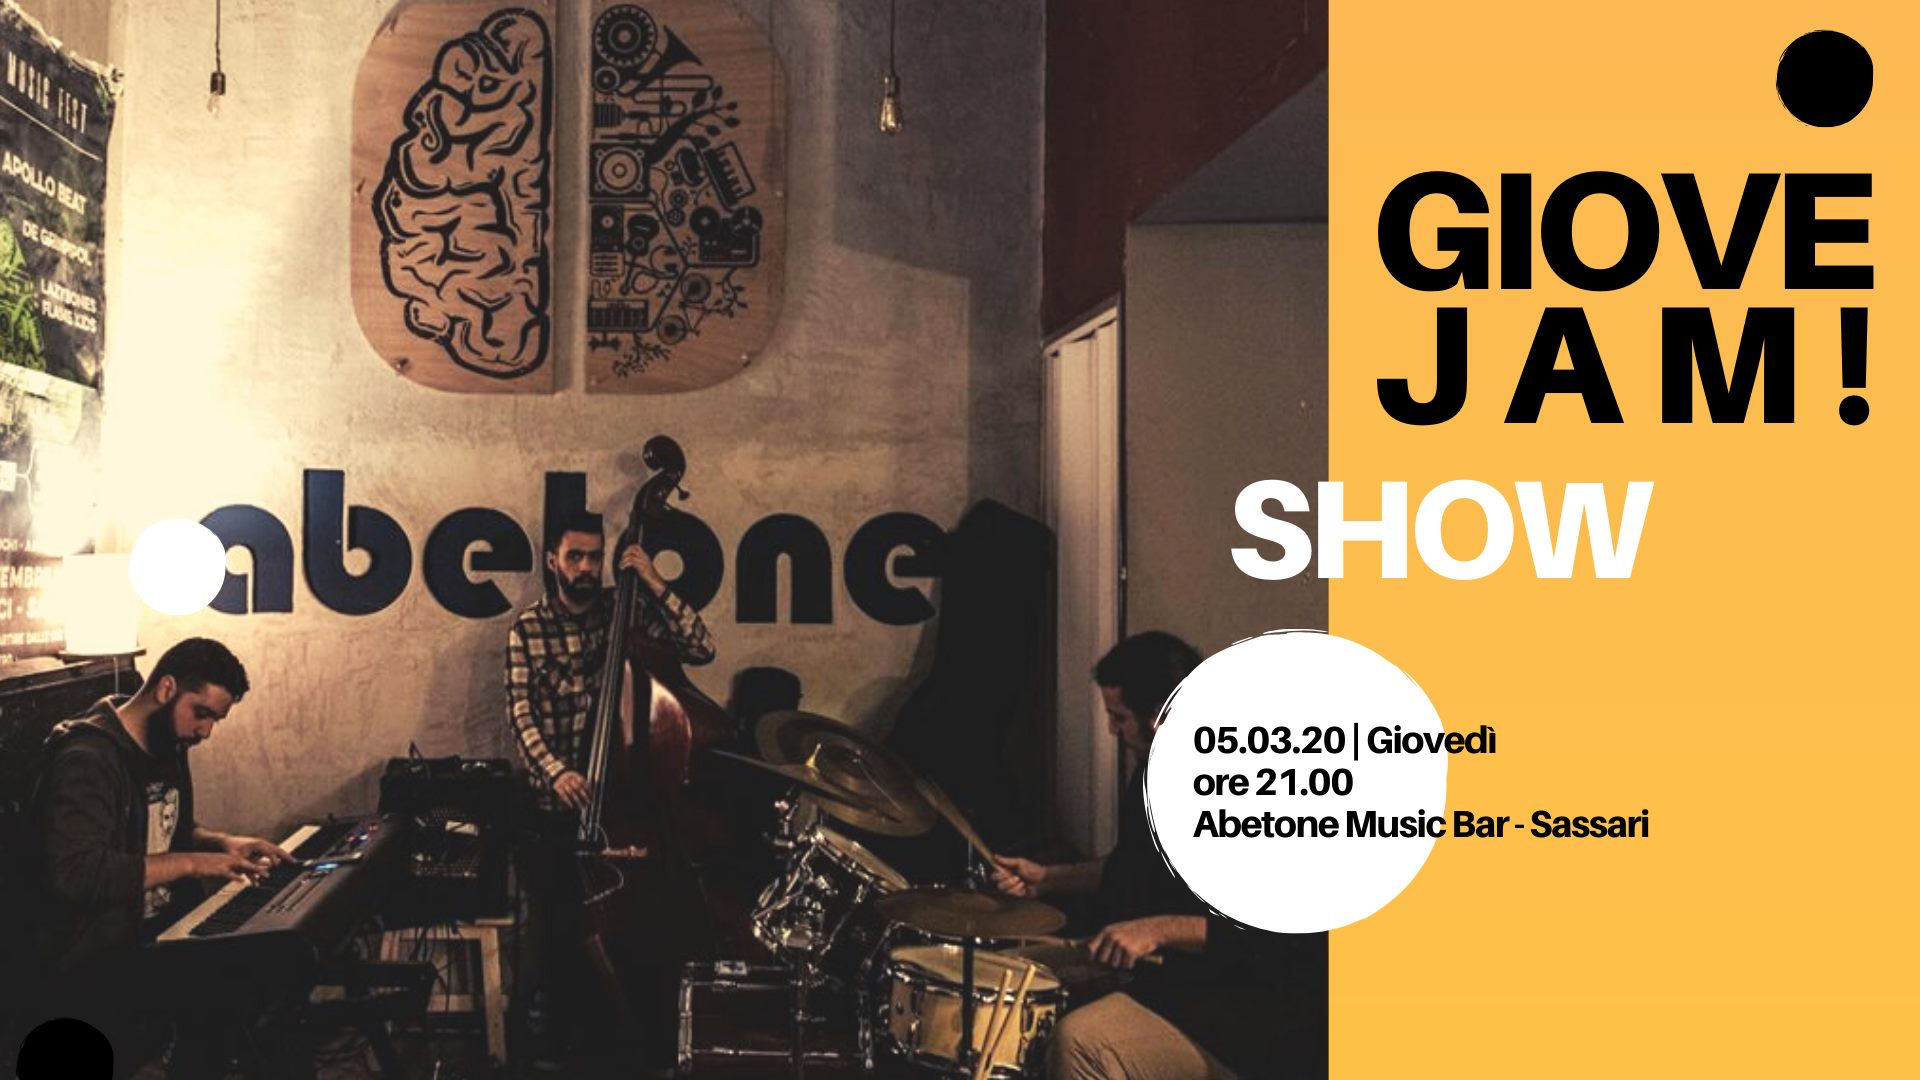 Giovejazz - GioveJam! - Abetone Music Bar - Sassari - 5 marzo 2020 - eventi - 2020 - Sa Scena Sarda